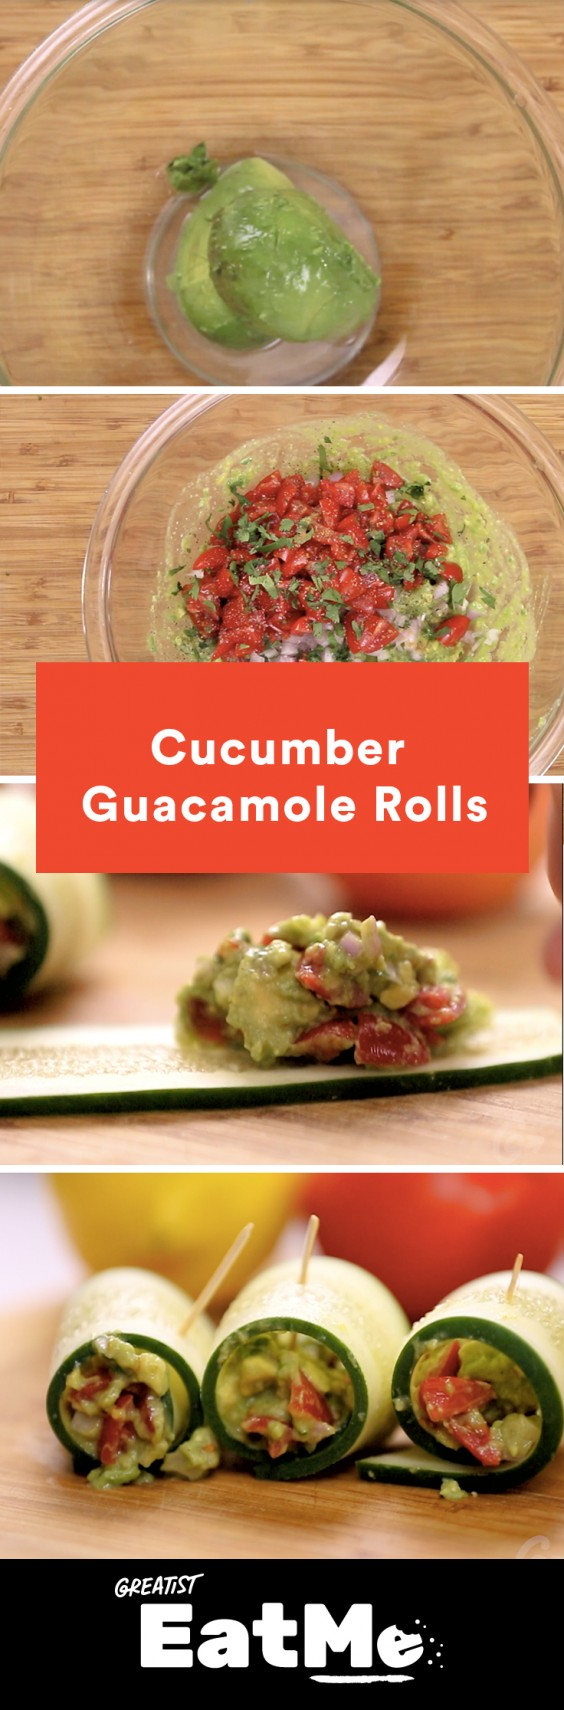 Eat Me Video: Cucumber Guac Rolls